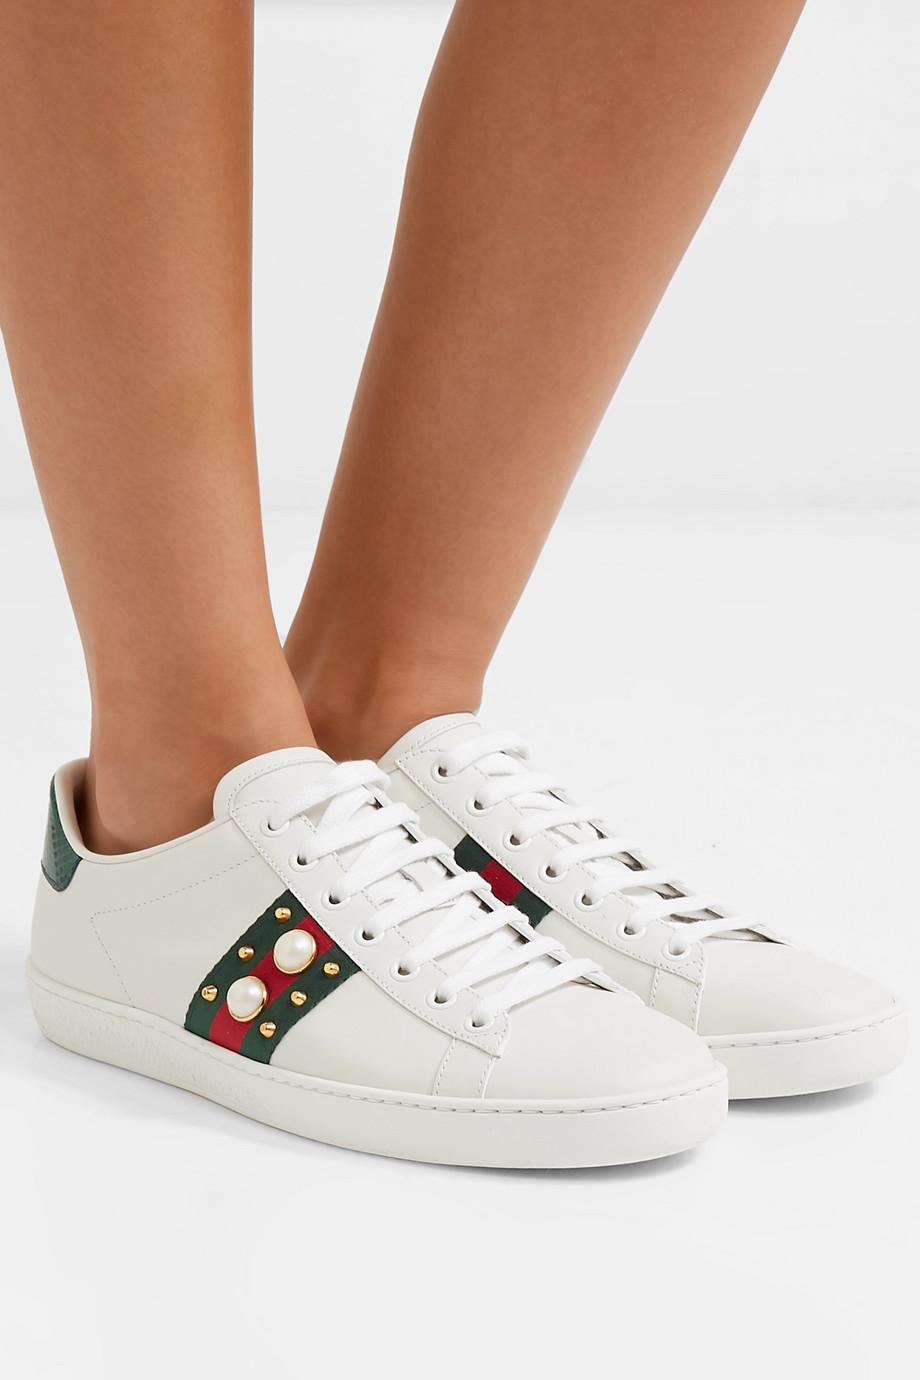 Gucci Ace 人造珍珠缀饰金属感水蛇皮边饰皮革运动鞋